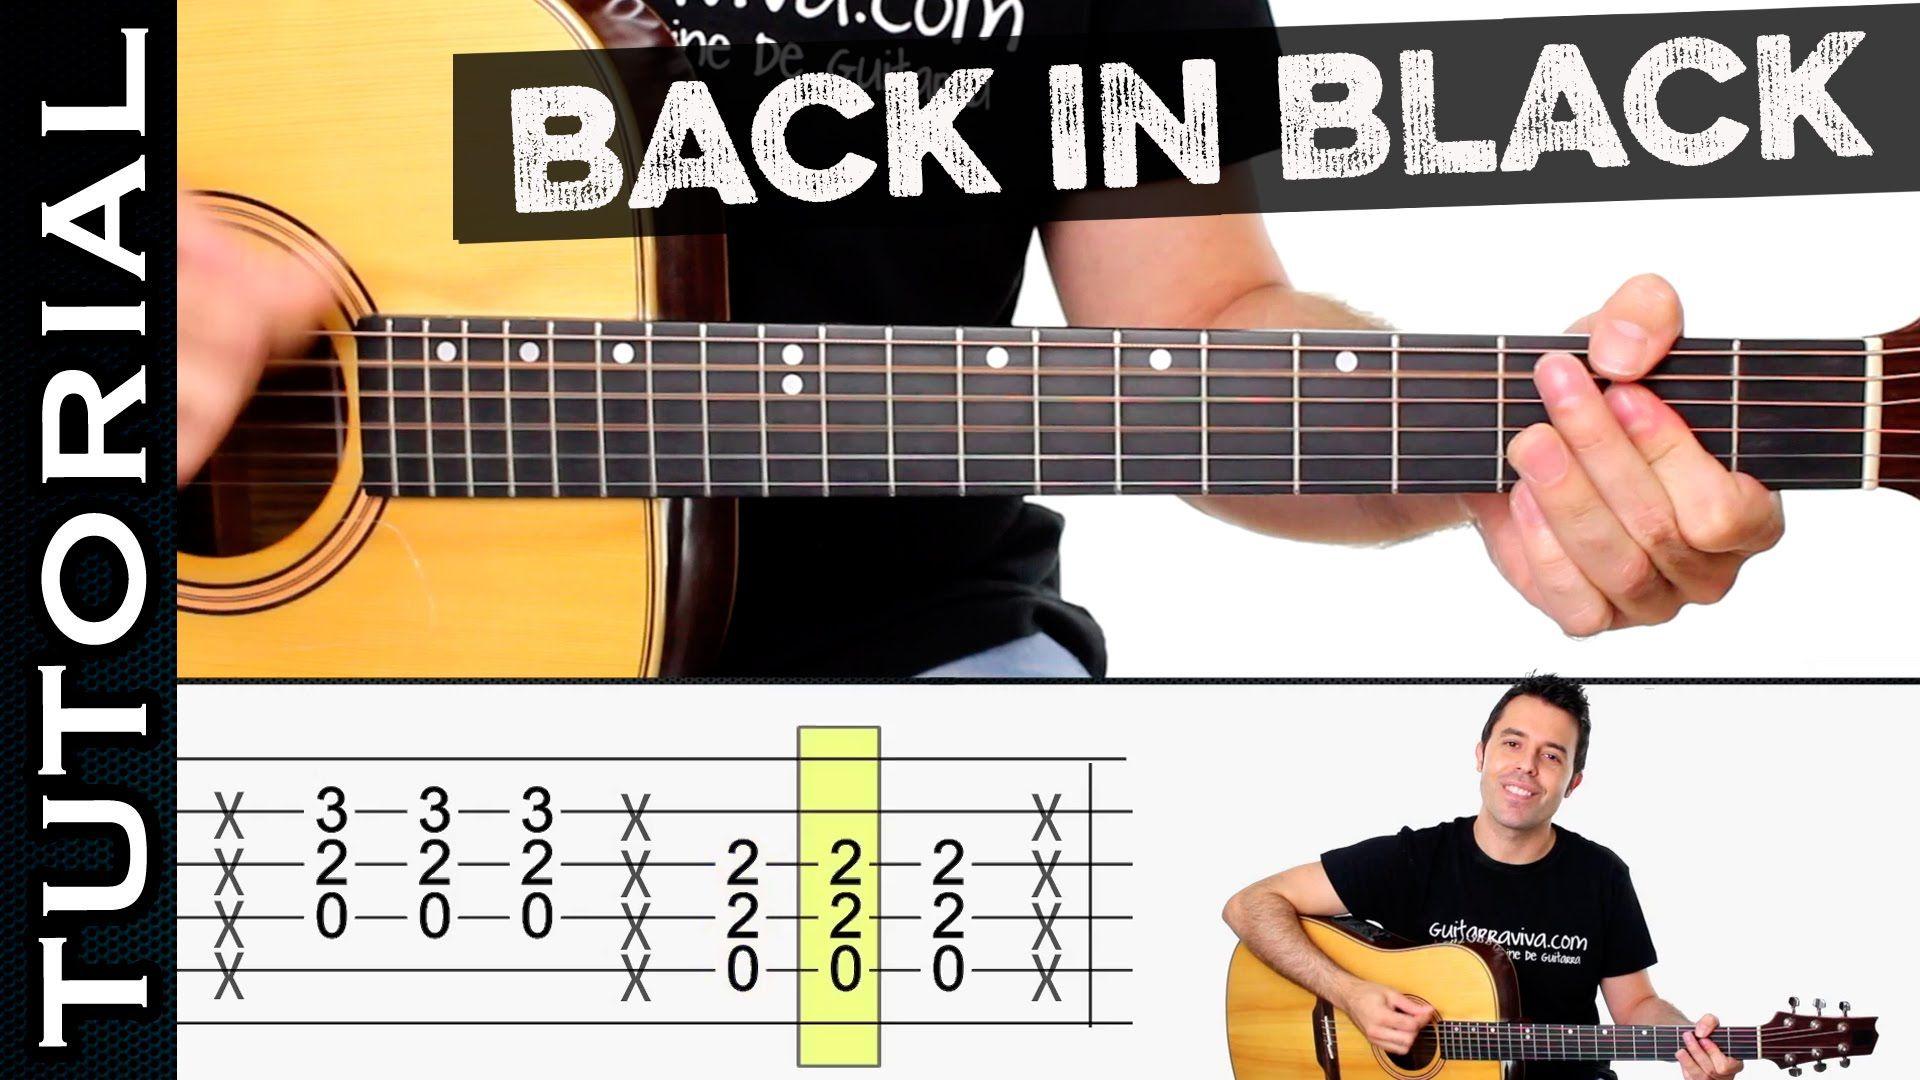 Como Tocar Back In Black En Guitarra Acústica Tutorial Completo Guitarras Guitarra Acustica Canciones De Guitarra